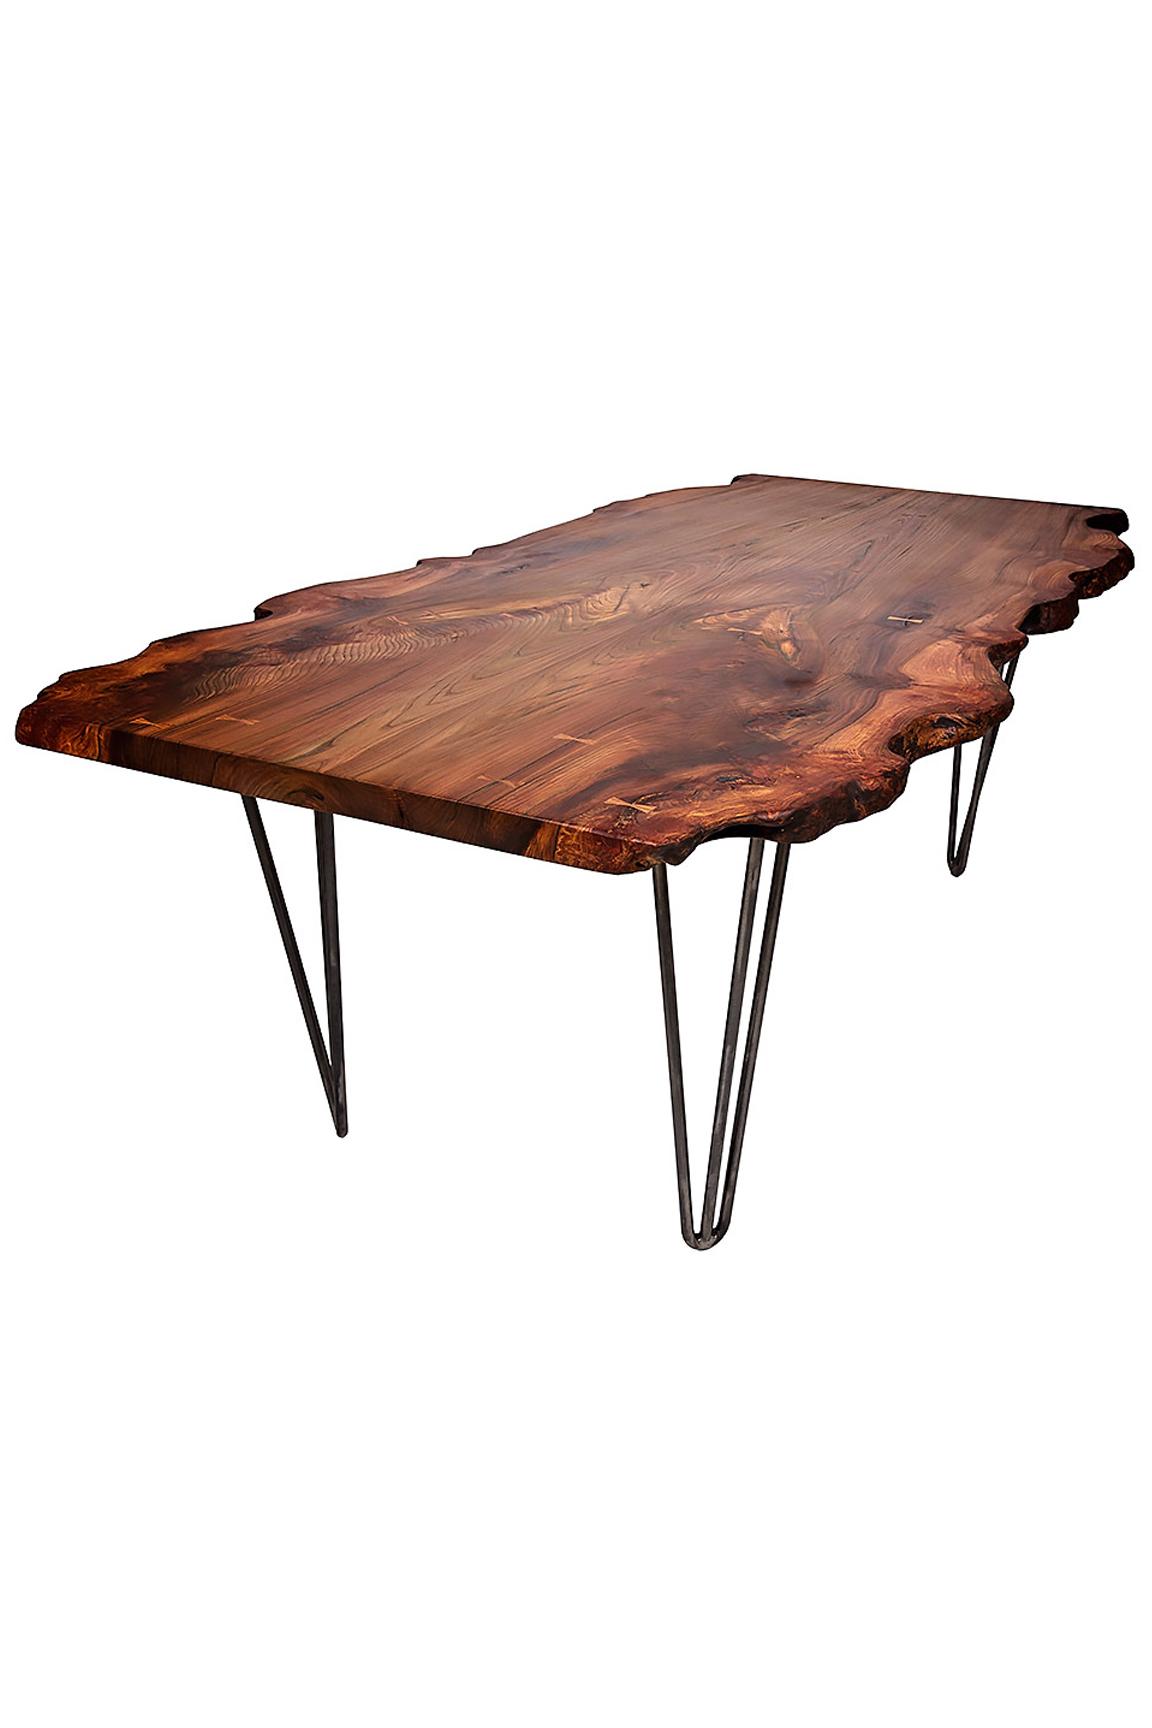 Ollie Oak Coffee Table on Hairpin Legs — Paul Frampton